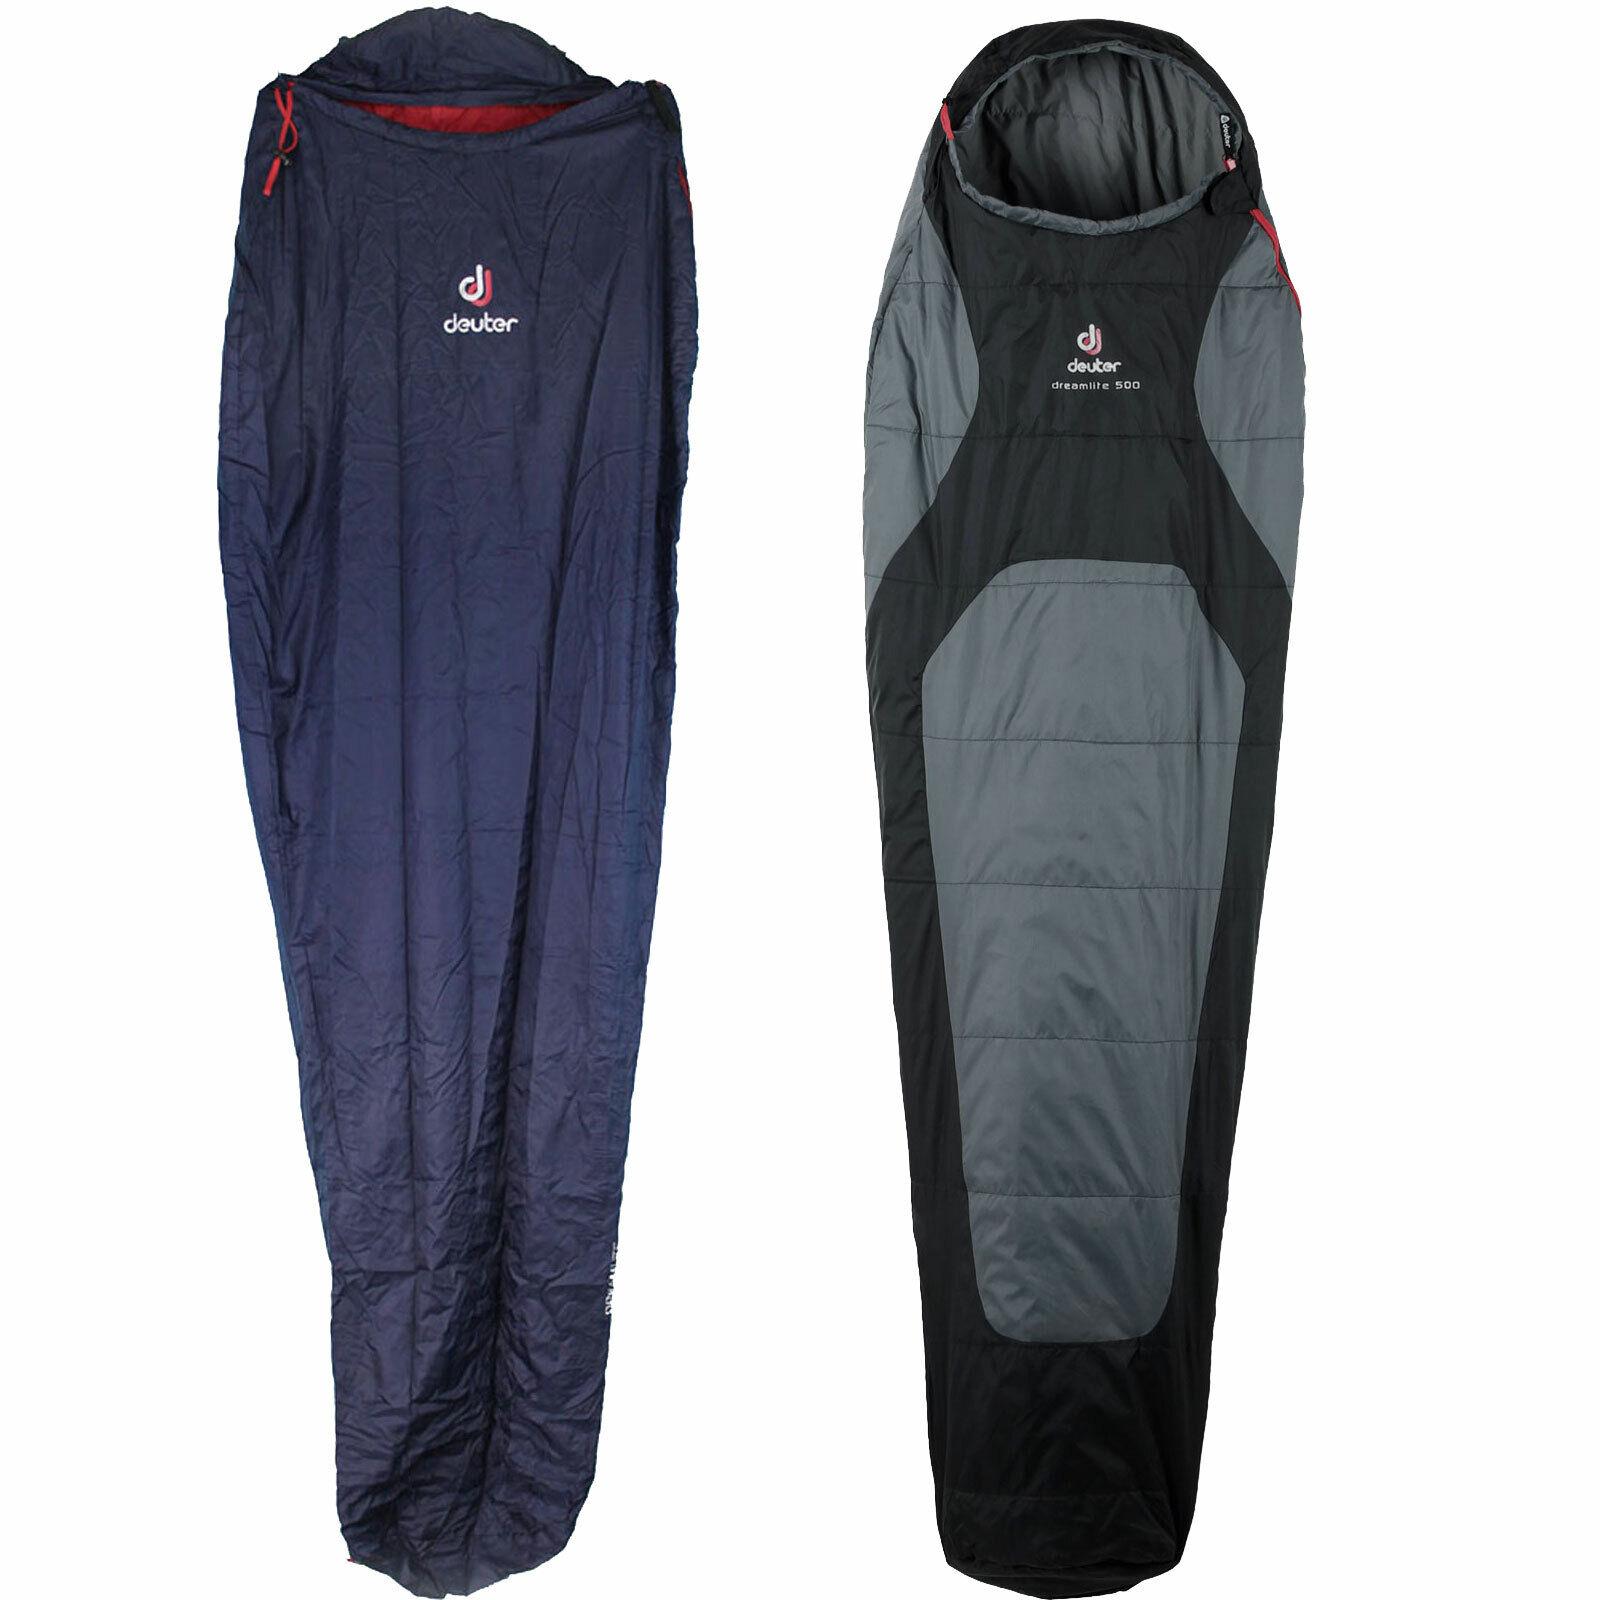 Deuter Dream Lite Sleeping Bag Mummy Sleeping Bag Summer Outdoor Cabins Sleeping Bag